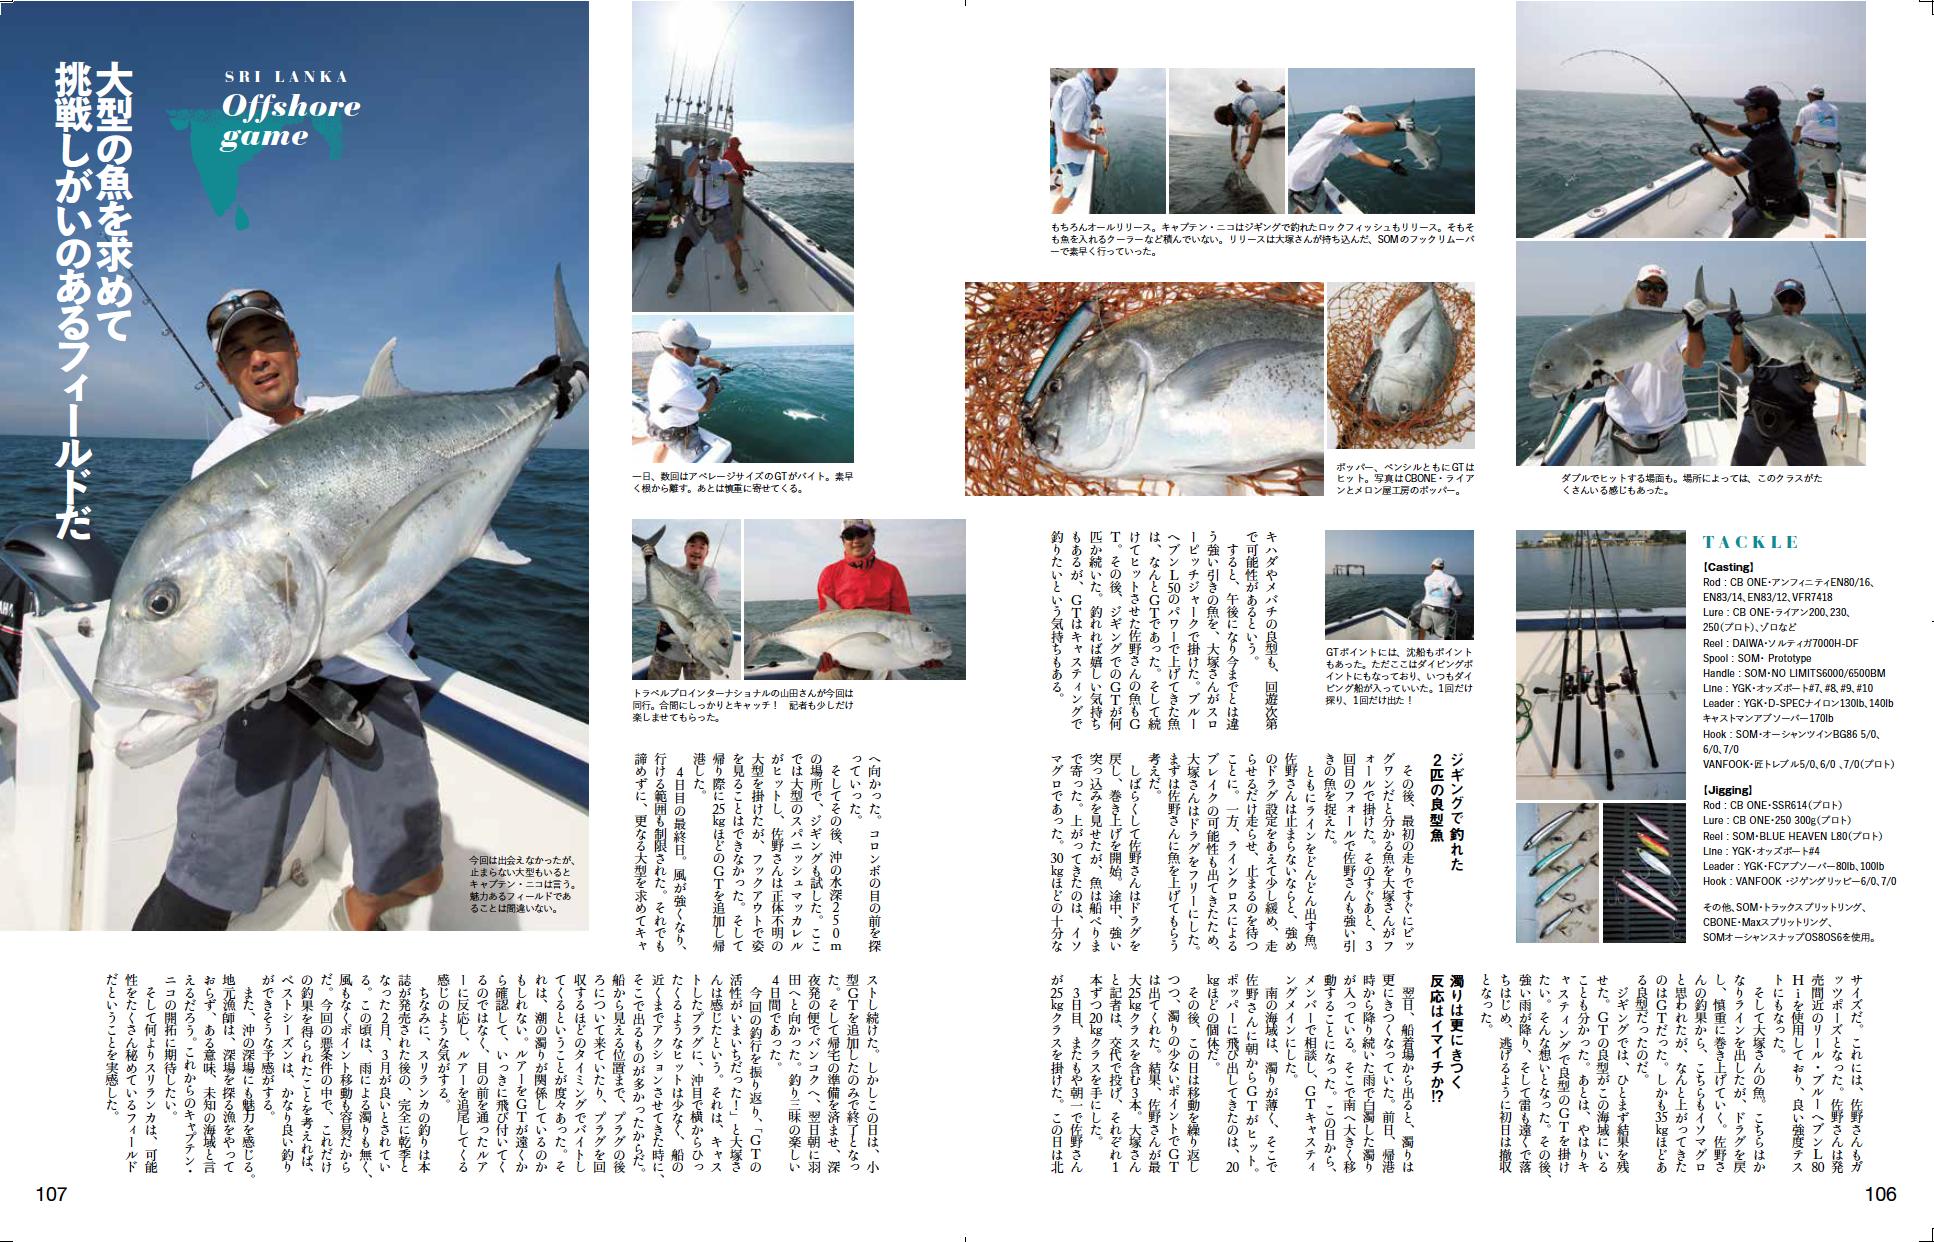 Popping and jigging sri lanka Salt World Magazine.png